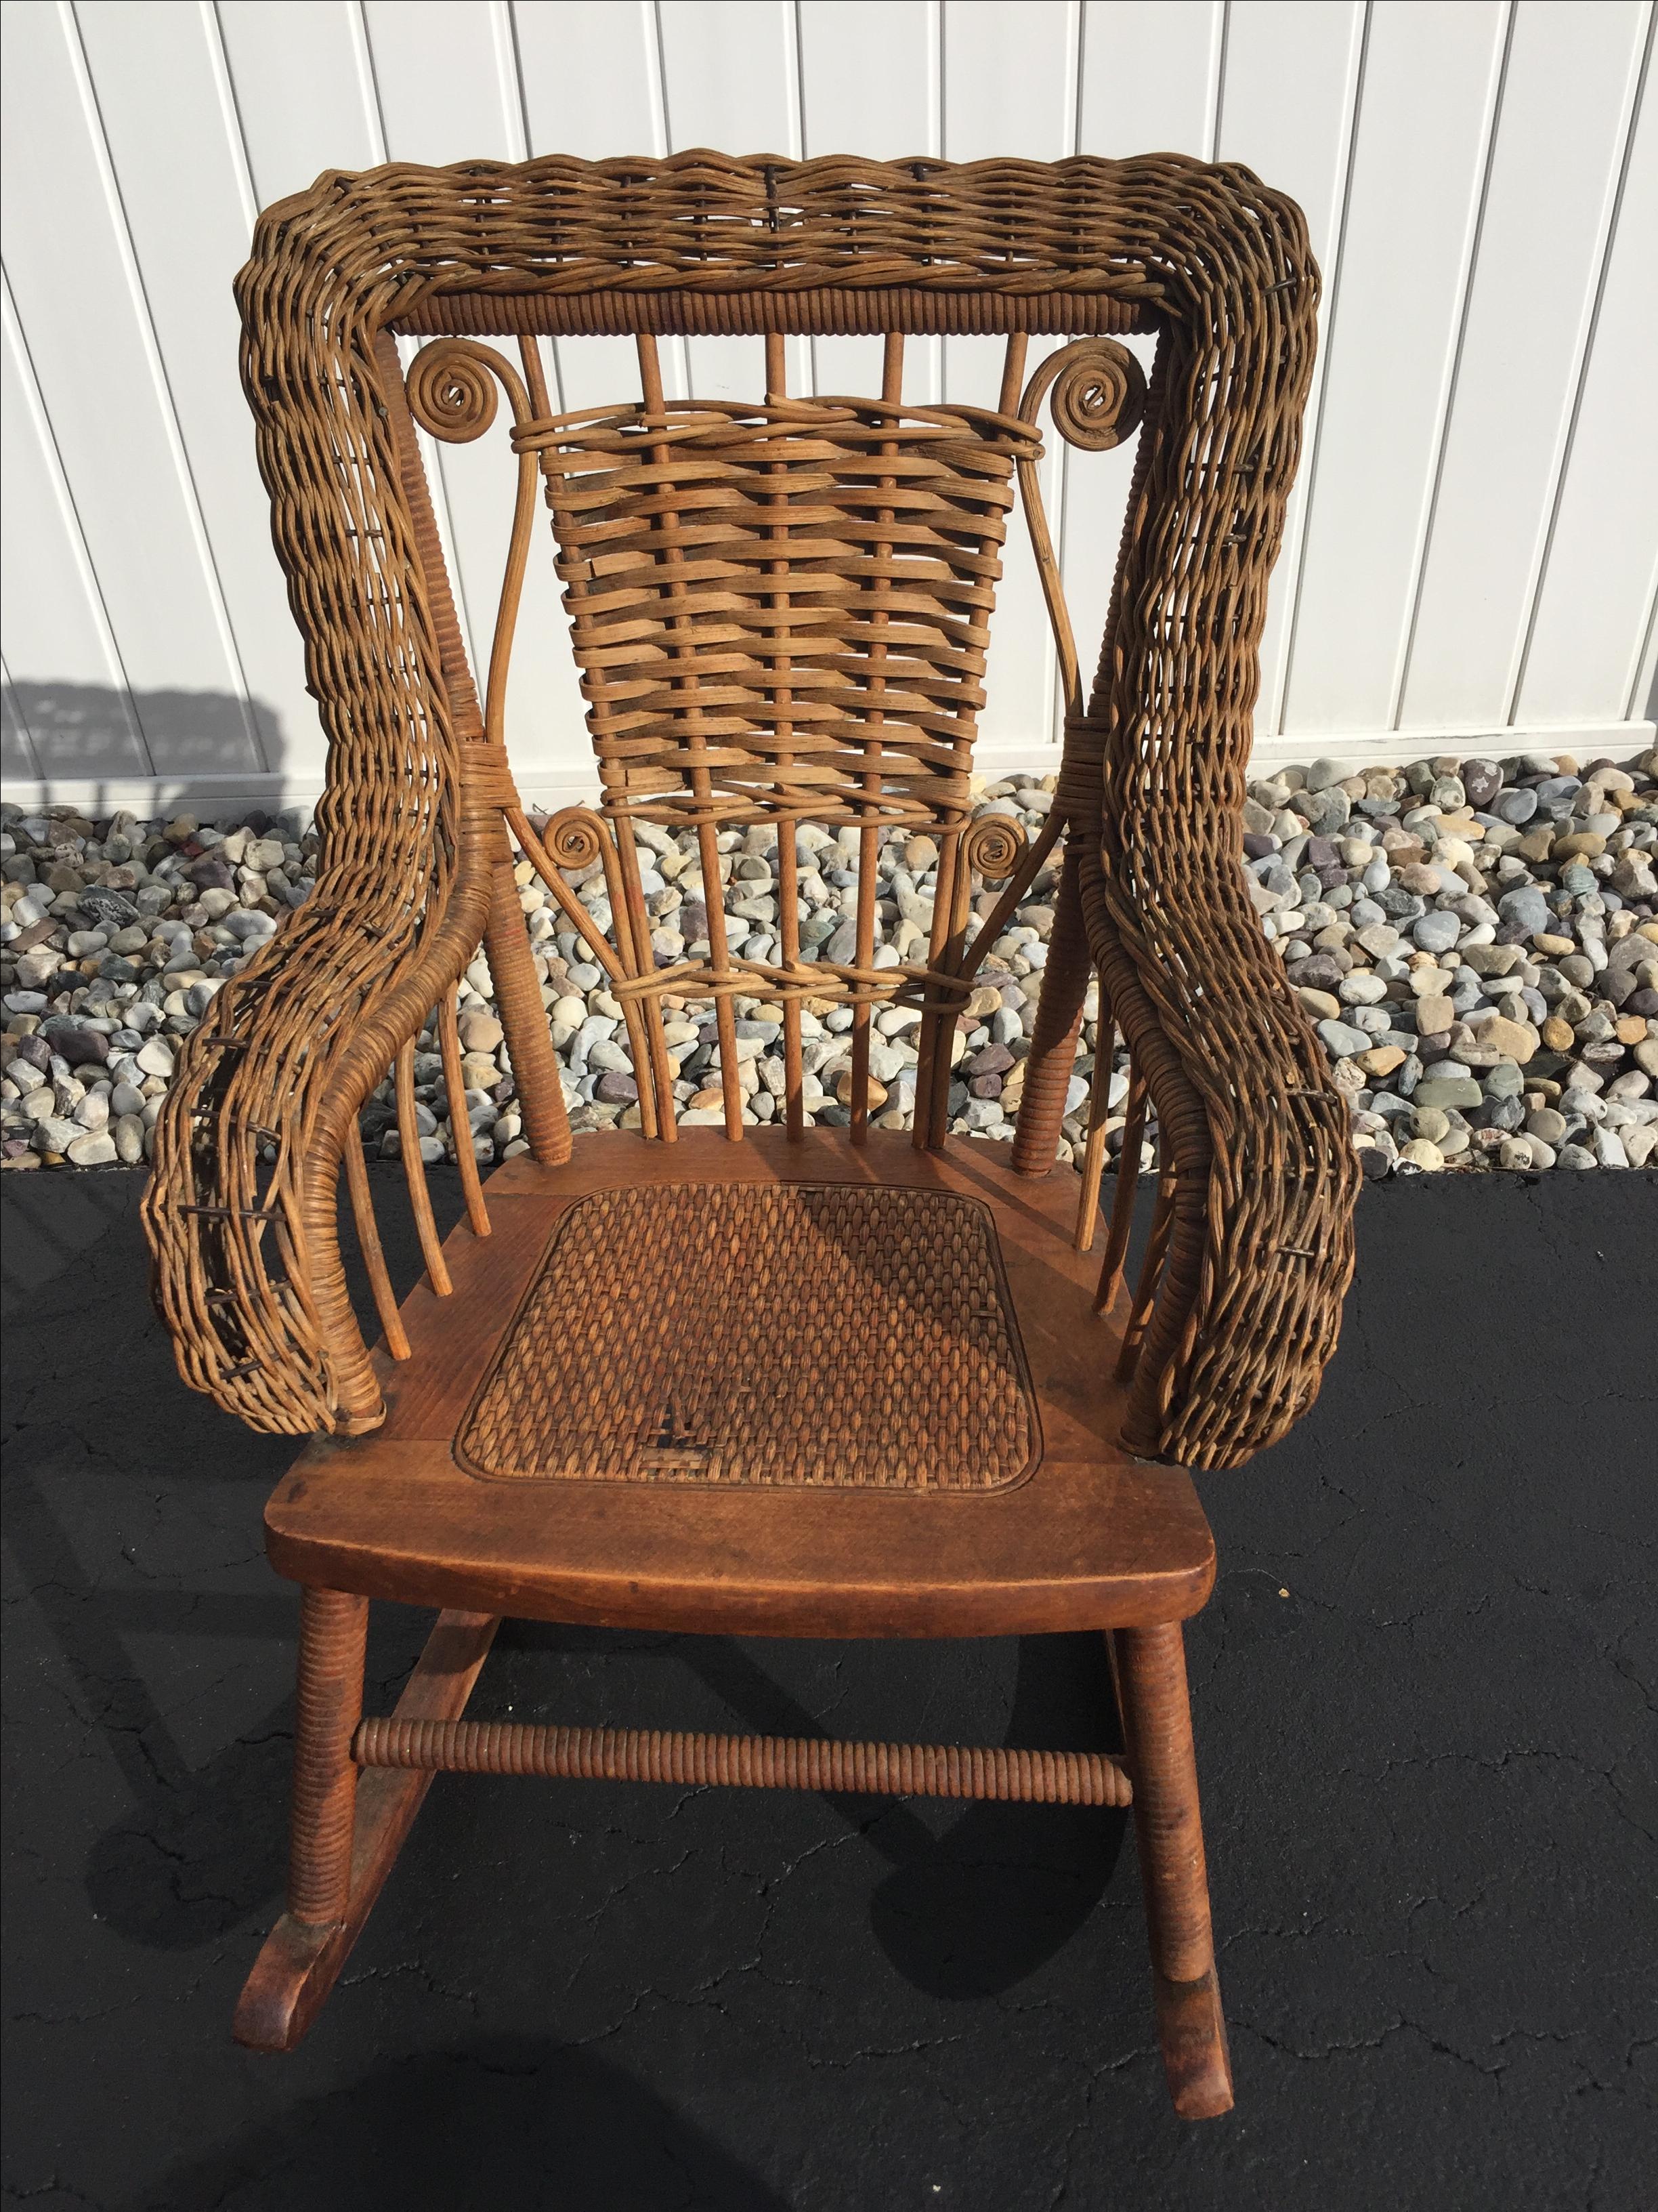 Antique Childrenu0027s Wicker U0026 Spindle Rocking Chair   Image ...